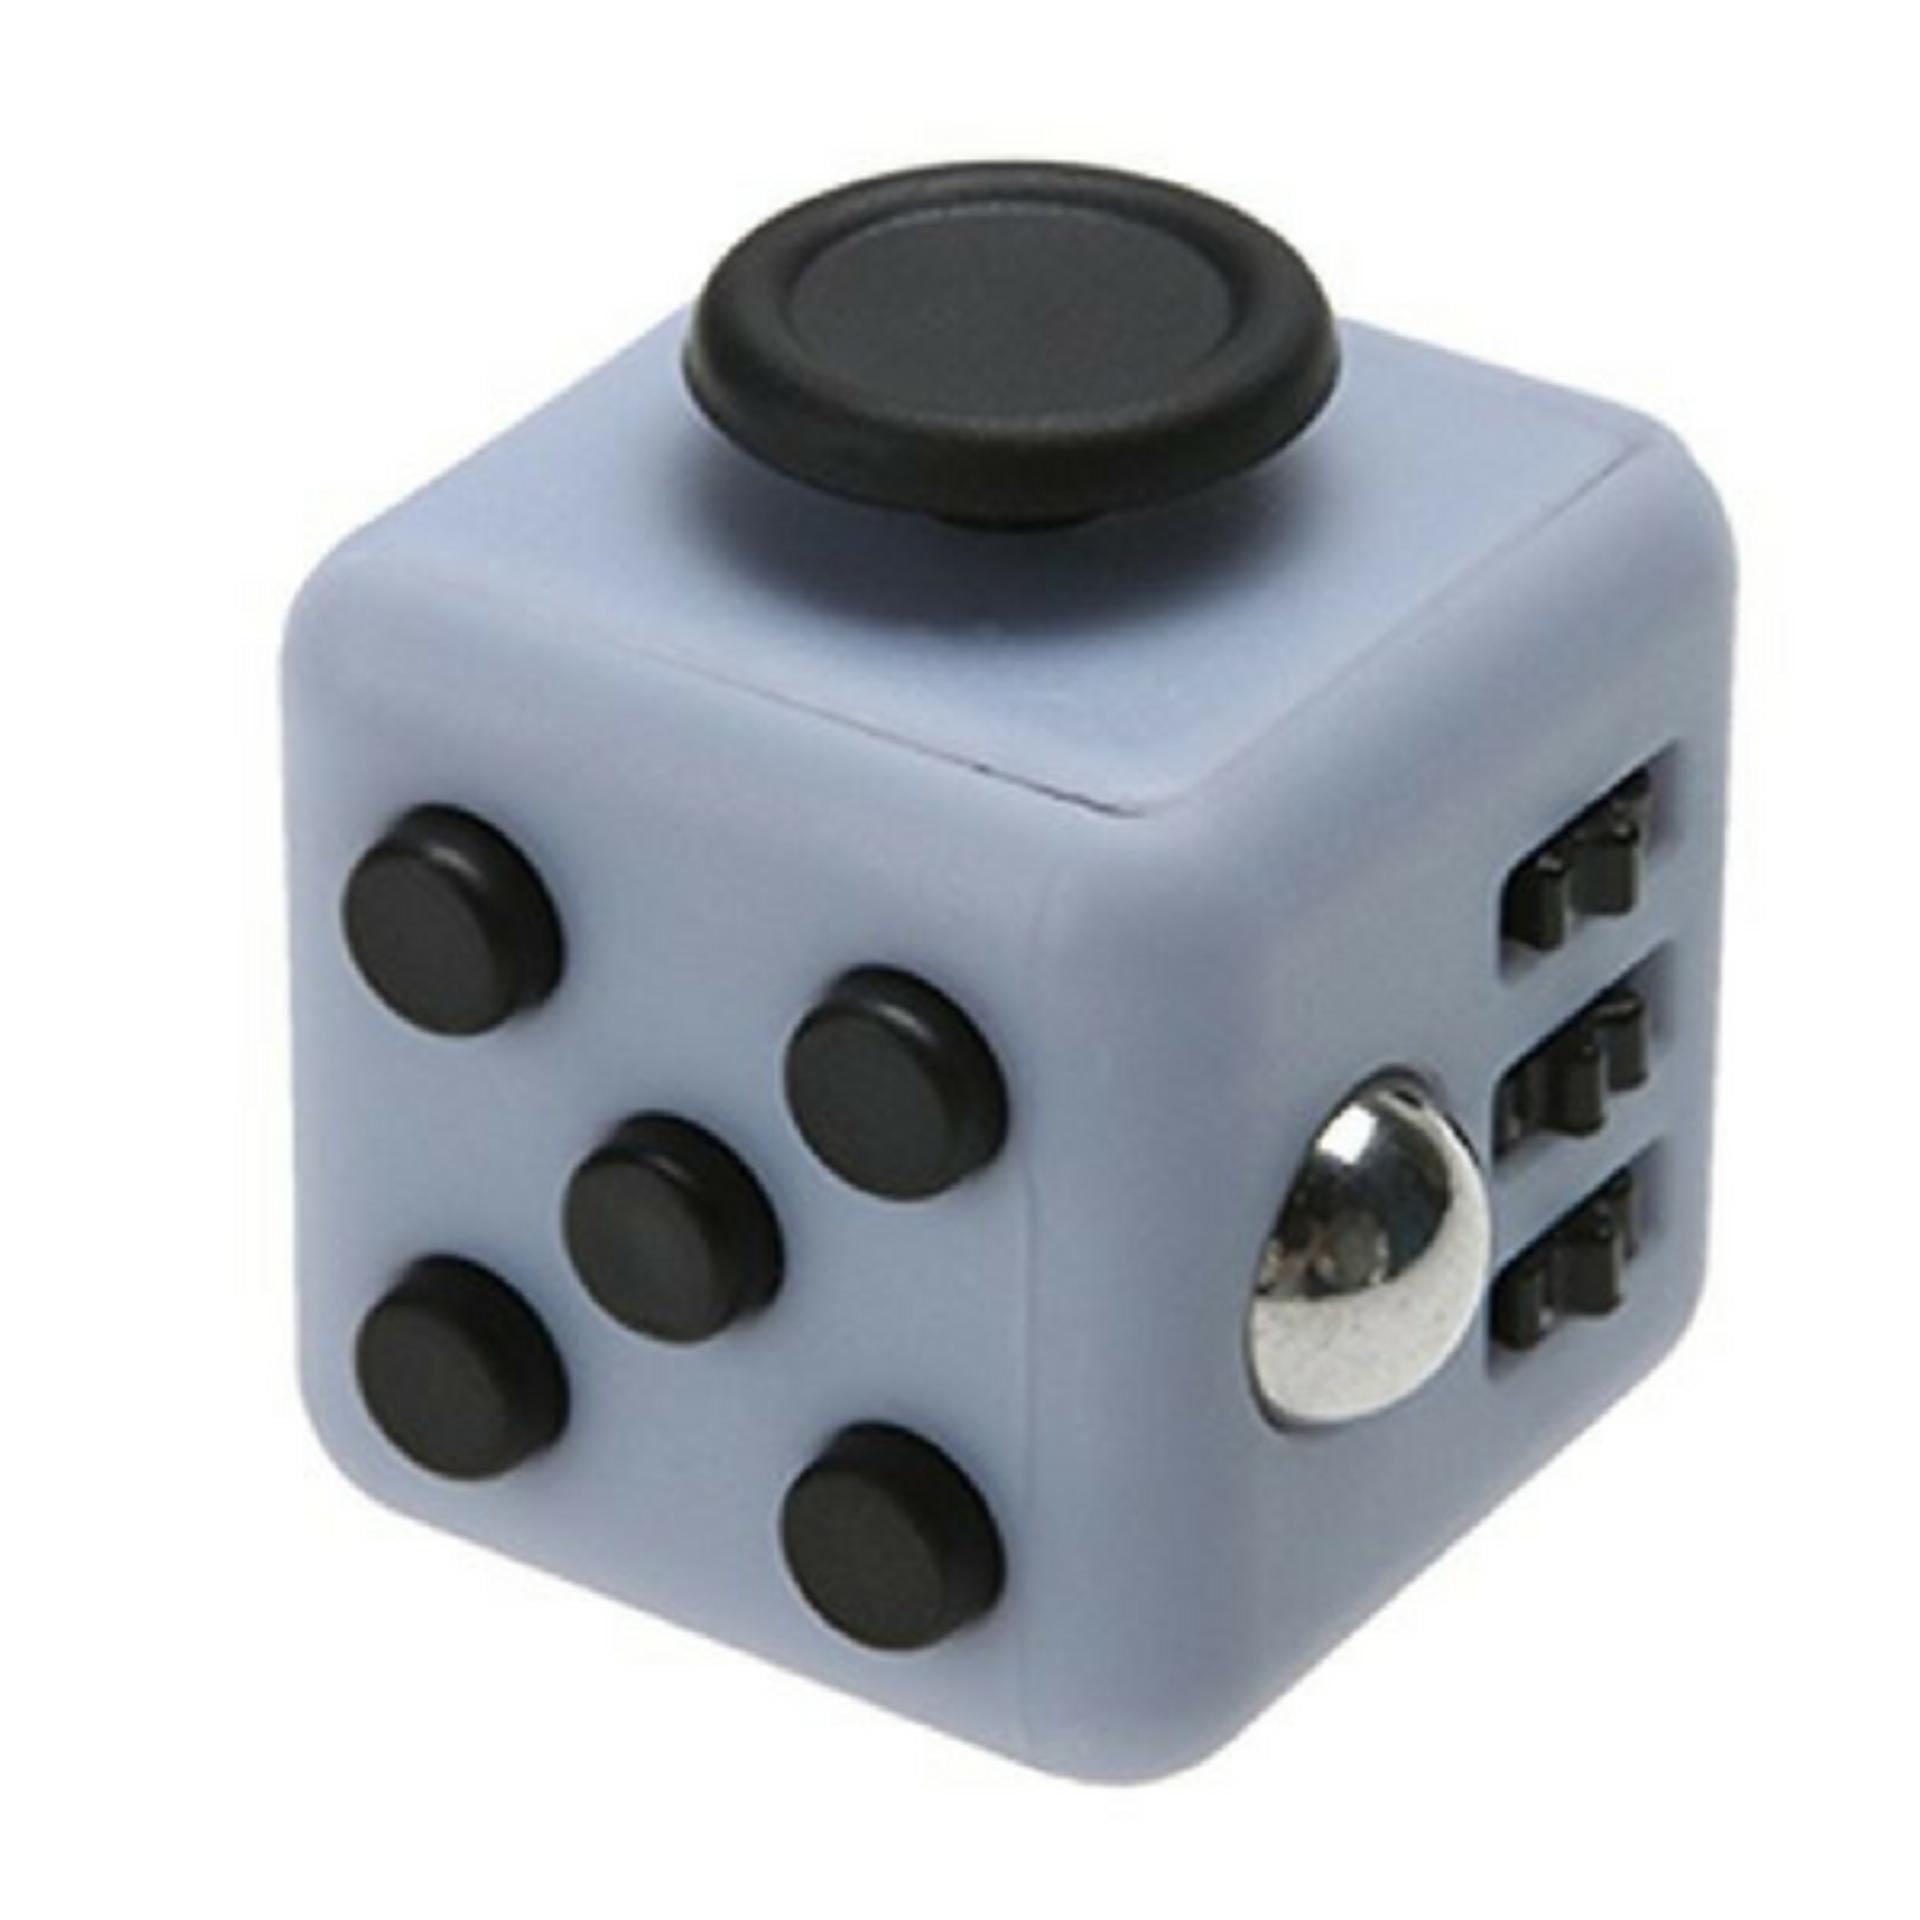 ... Fidget Cube Magic Cube 6 Side Classic - Premium Quality - Light Grey-Black ...